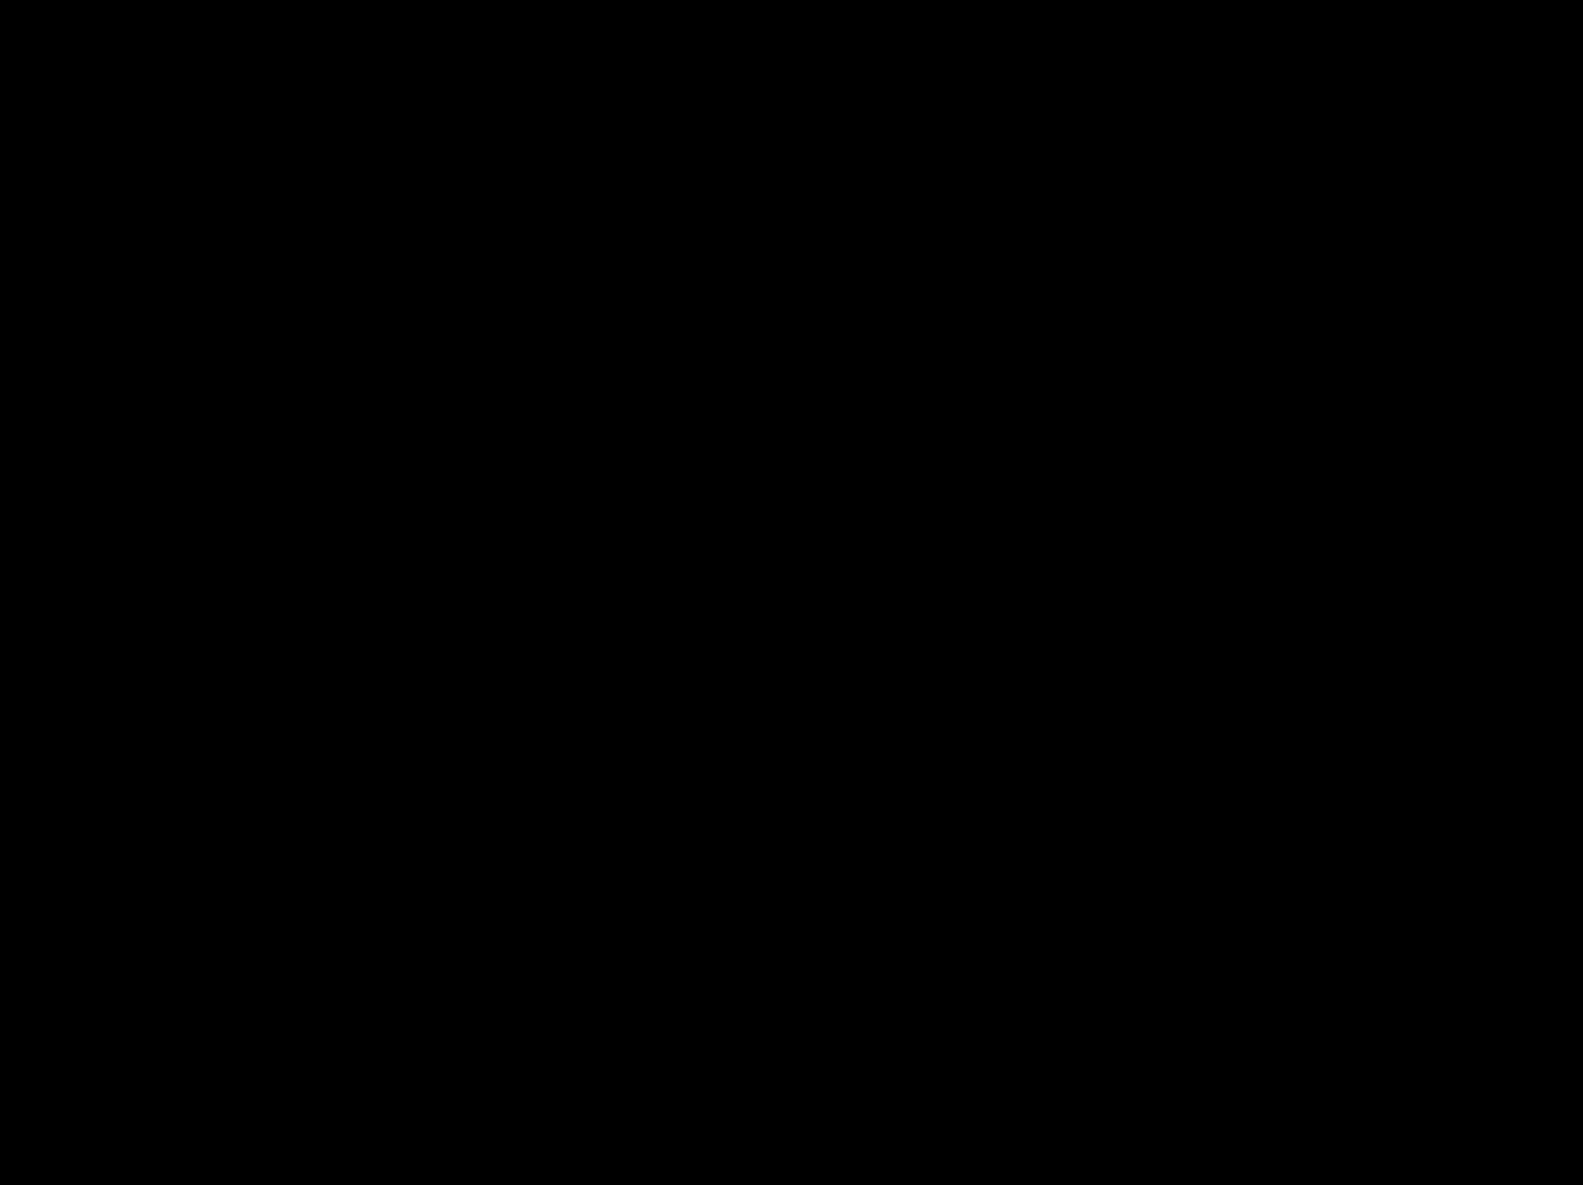 Atropa belladonna: A Useful Medicinal Plant